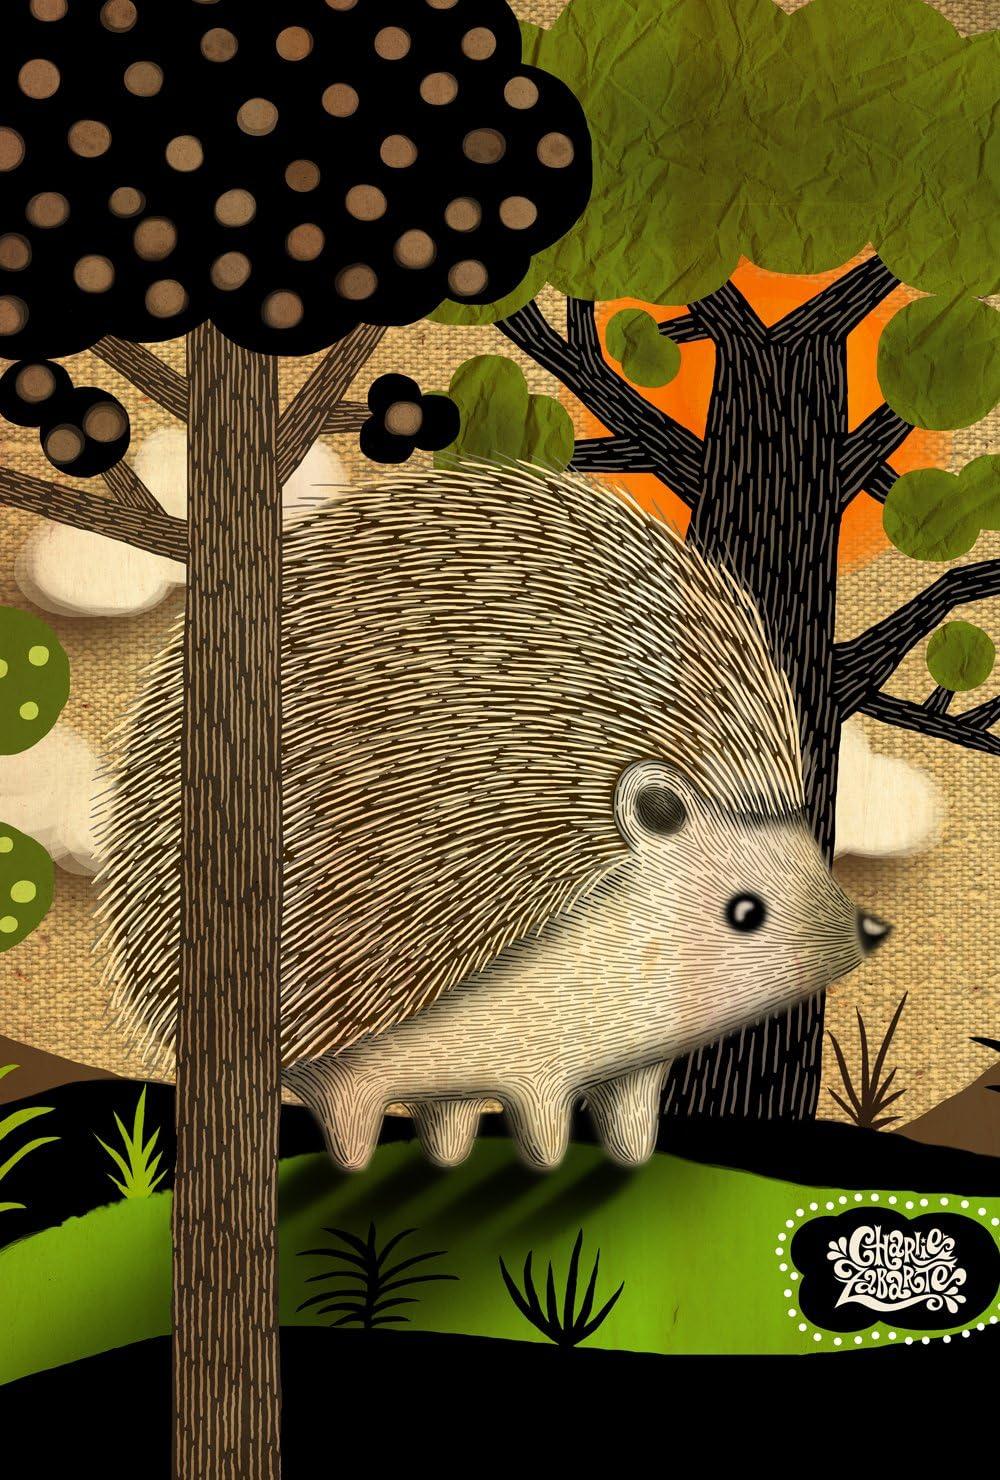 Toland Home Garden Happy Hedgehog 12.5 x 18 Inch Decorative Cute Forest Animal Outdoors Garden Flag